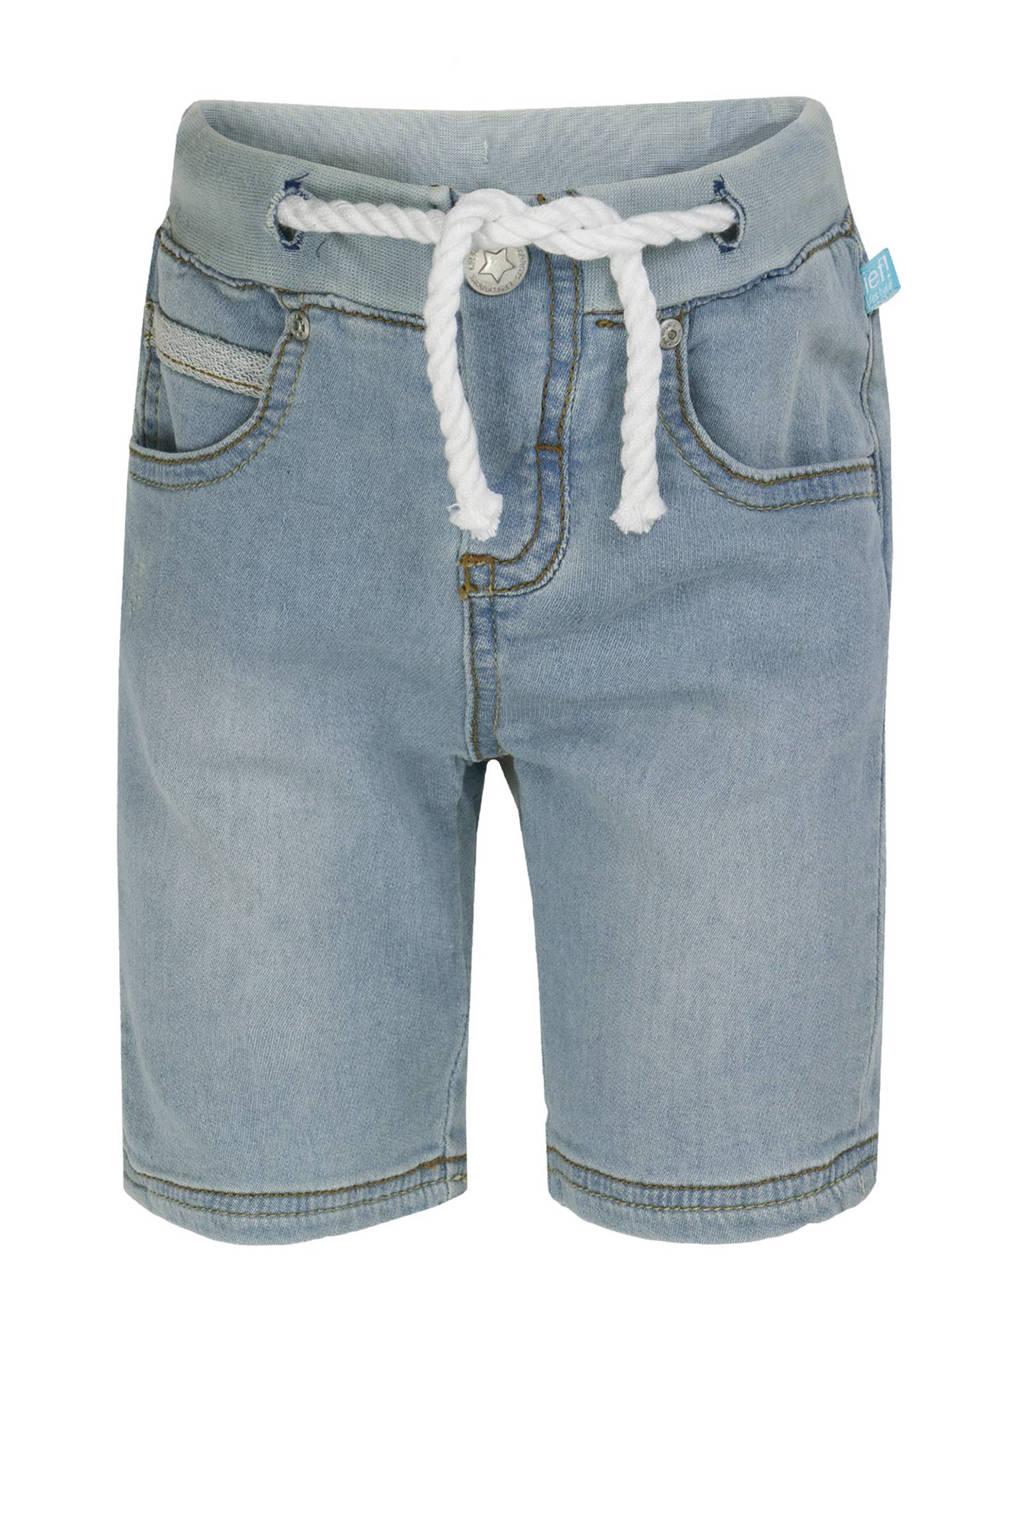 lief! jeans bermuda, Light denim